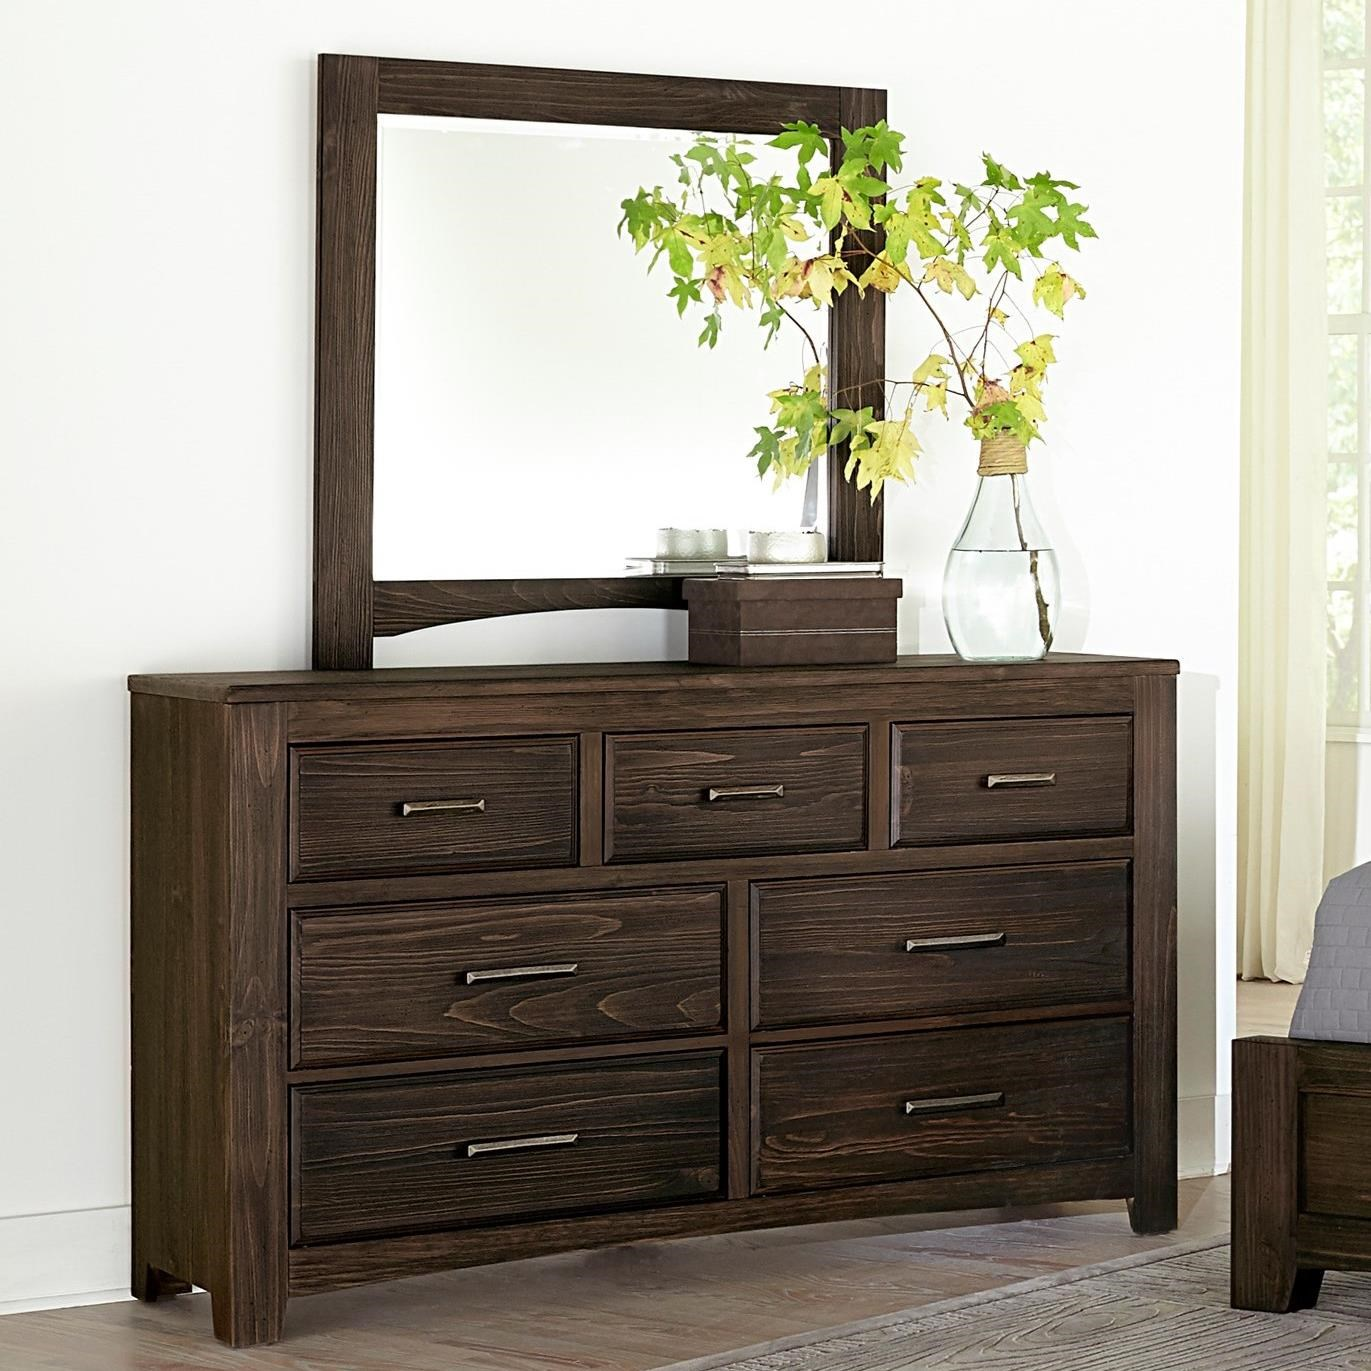 Cottage Too Dresser + Mirror Set by Vaughan Bassett at Lapeer Furniture & Mattress Center